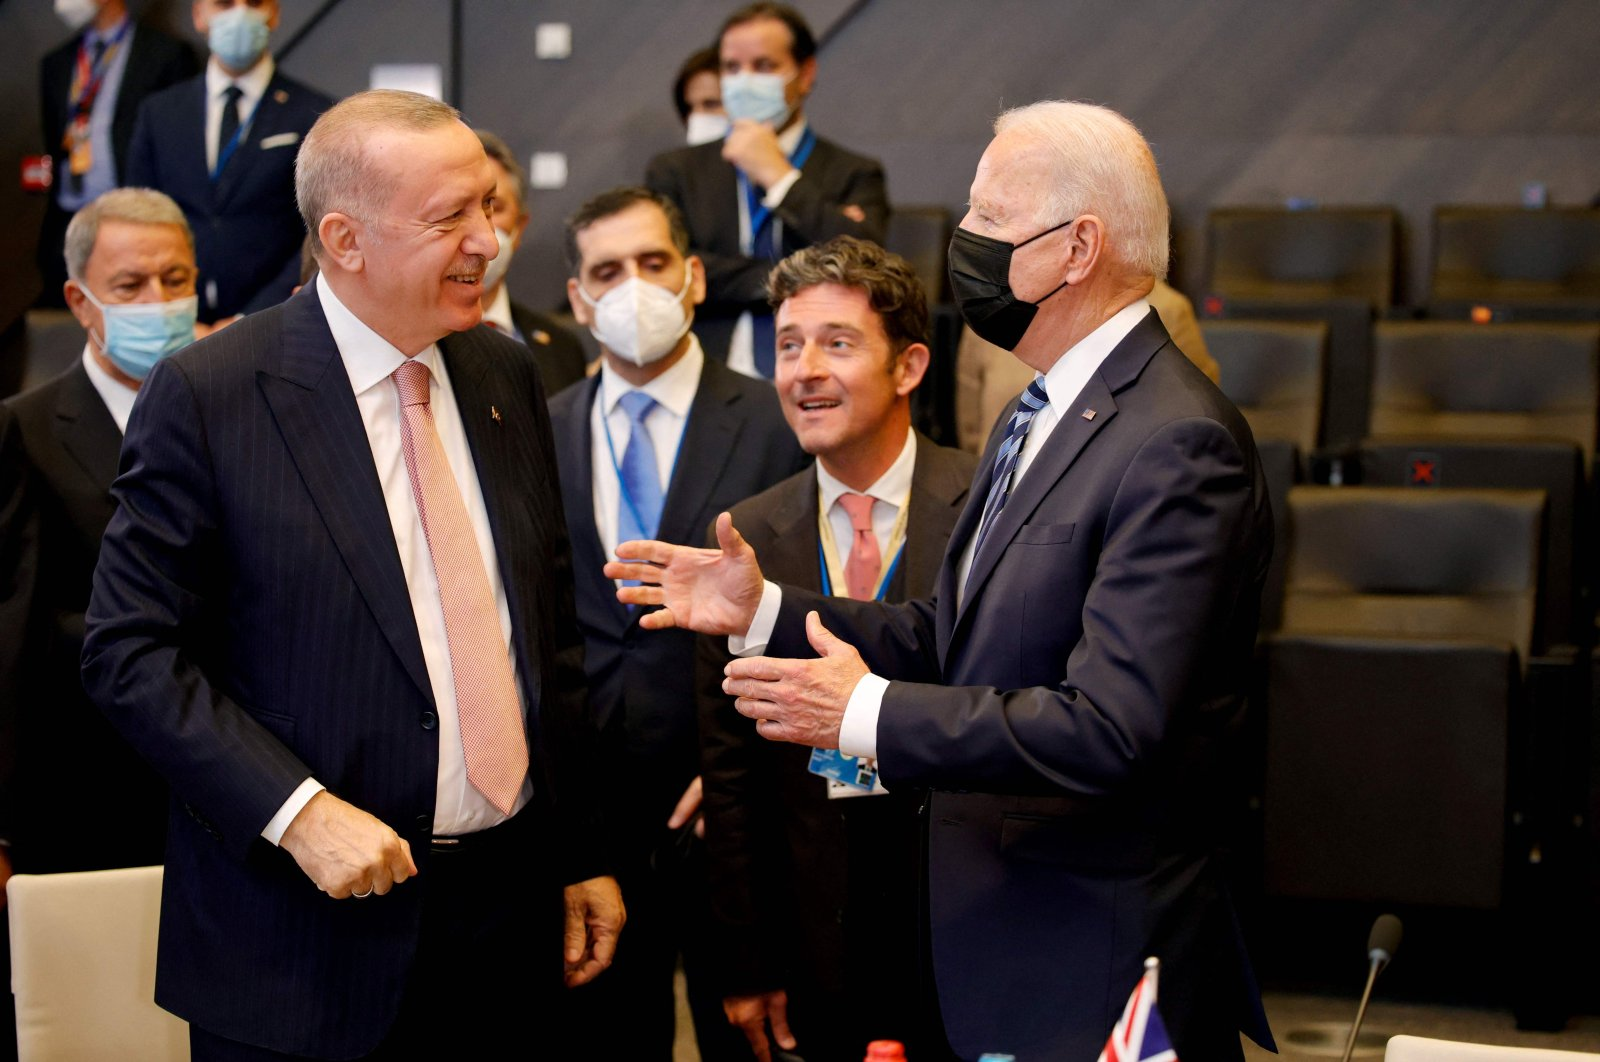 President Recep Tayyip Erdoğan (L) and U.S. President Joe Biden speak during a plenary session at a NATO summit in Brussels, Belgium, June 14, 2021. (AFP Photo)